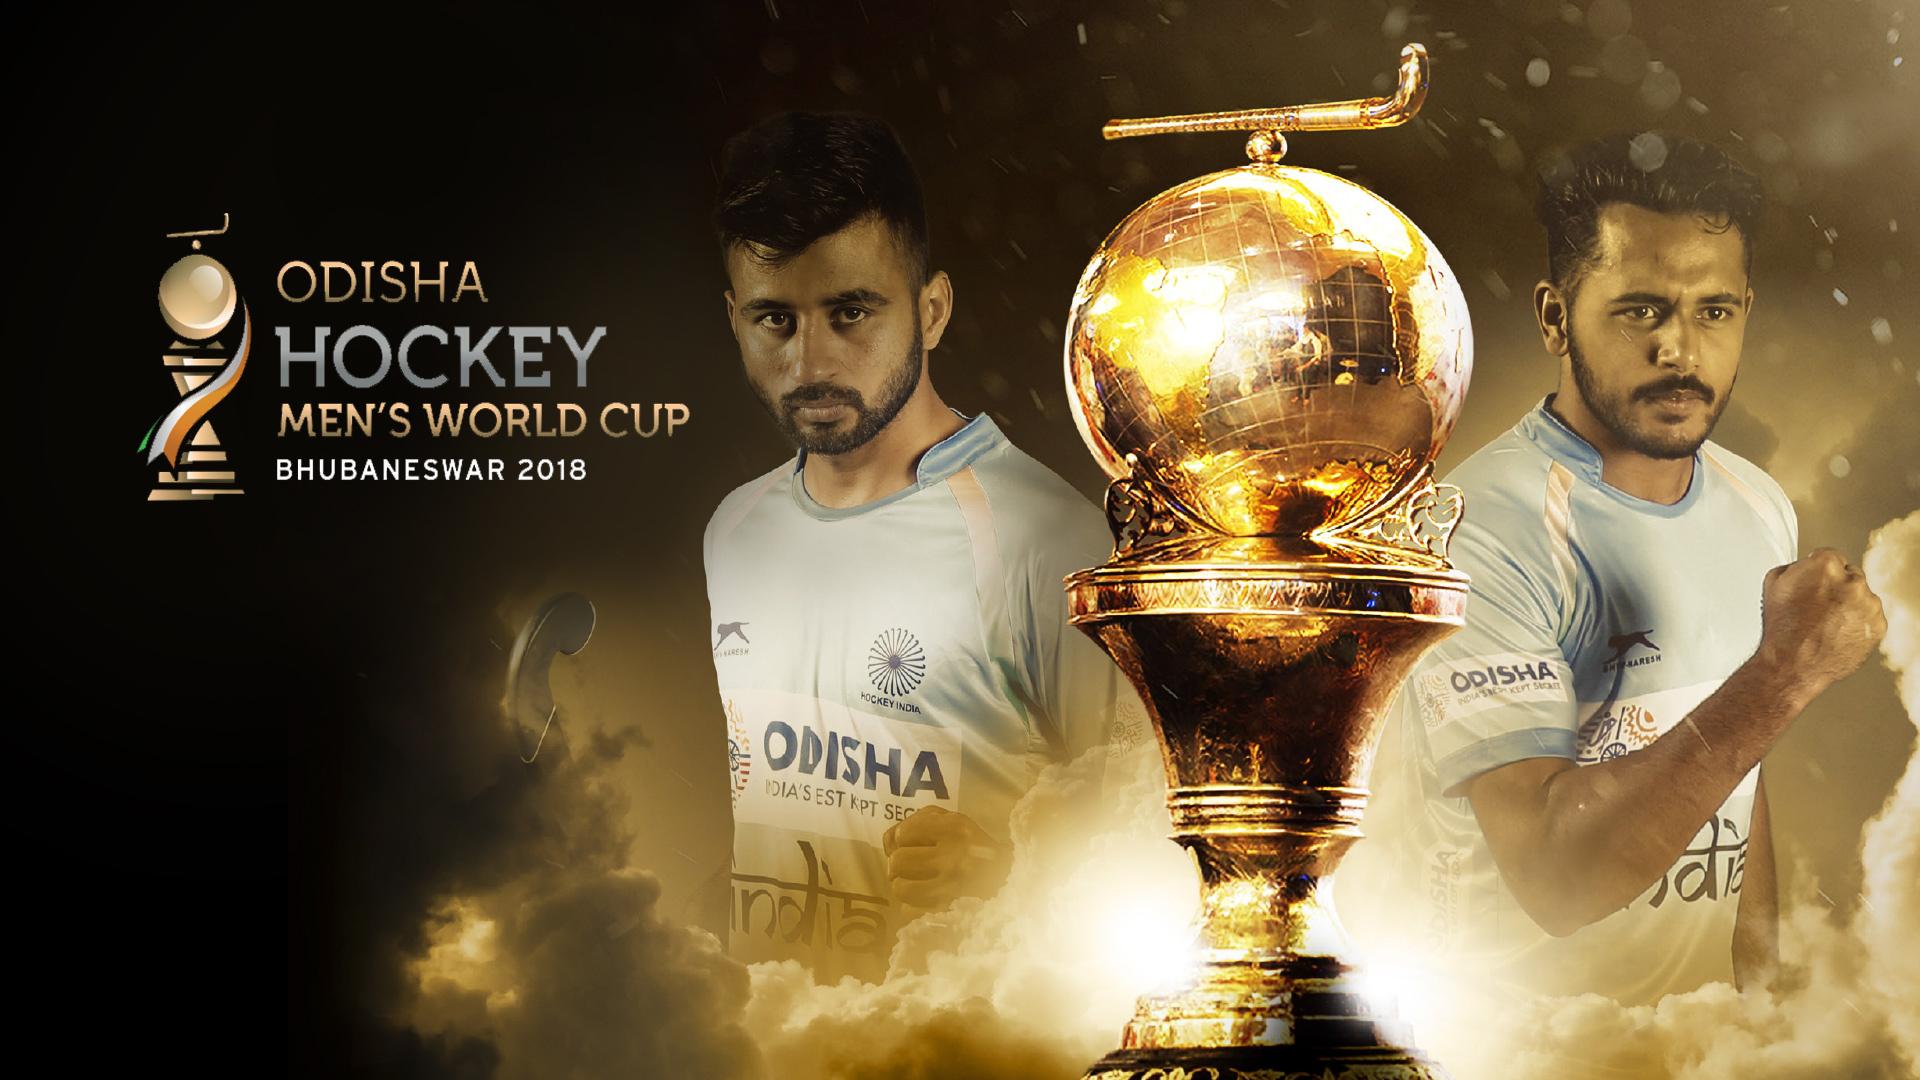 HOCKEY WORLD CUP HIGHLIGHTS